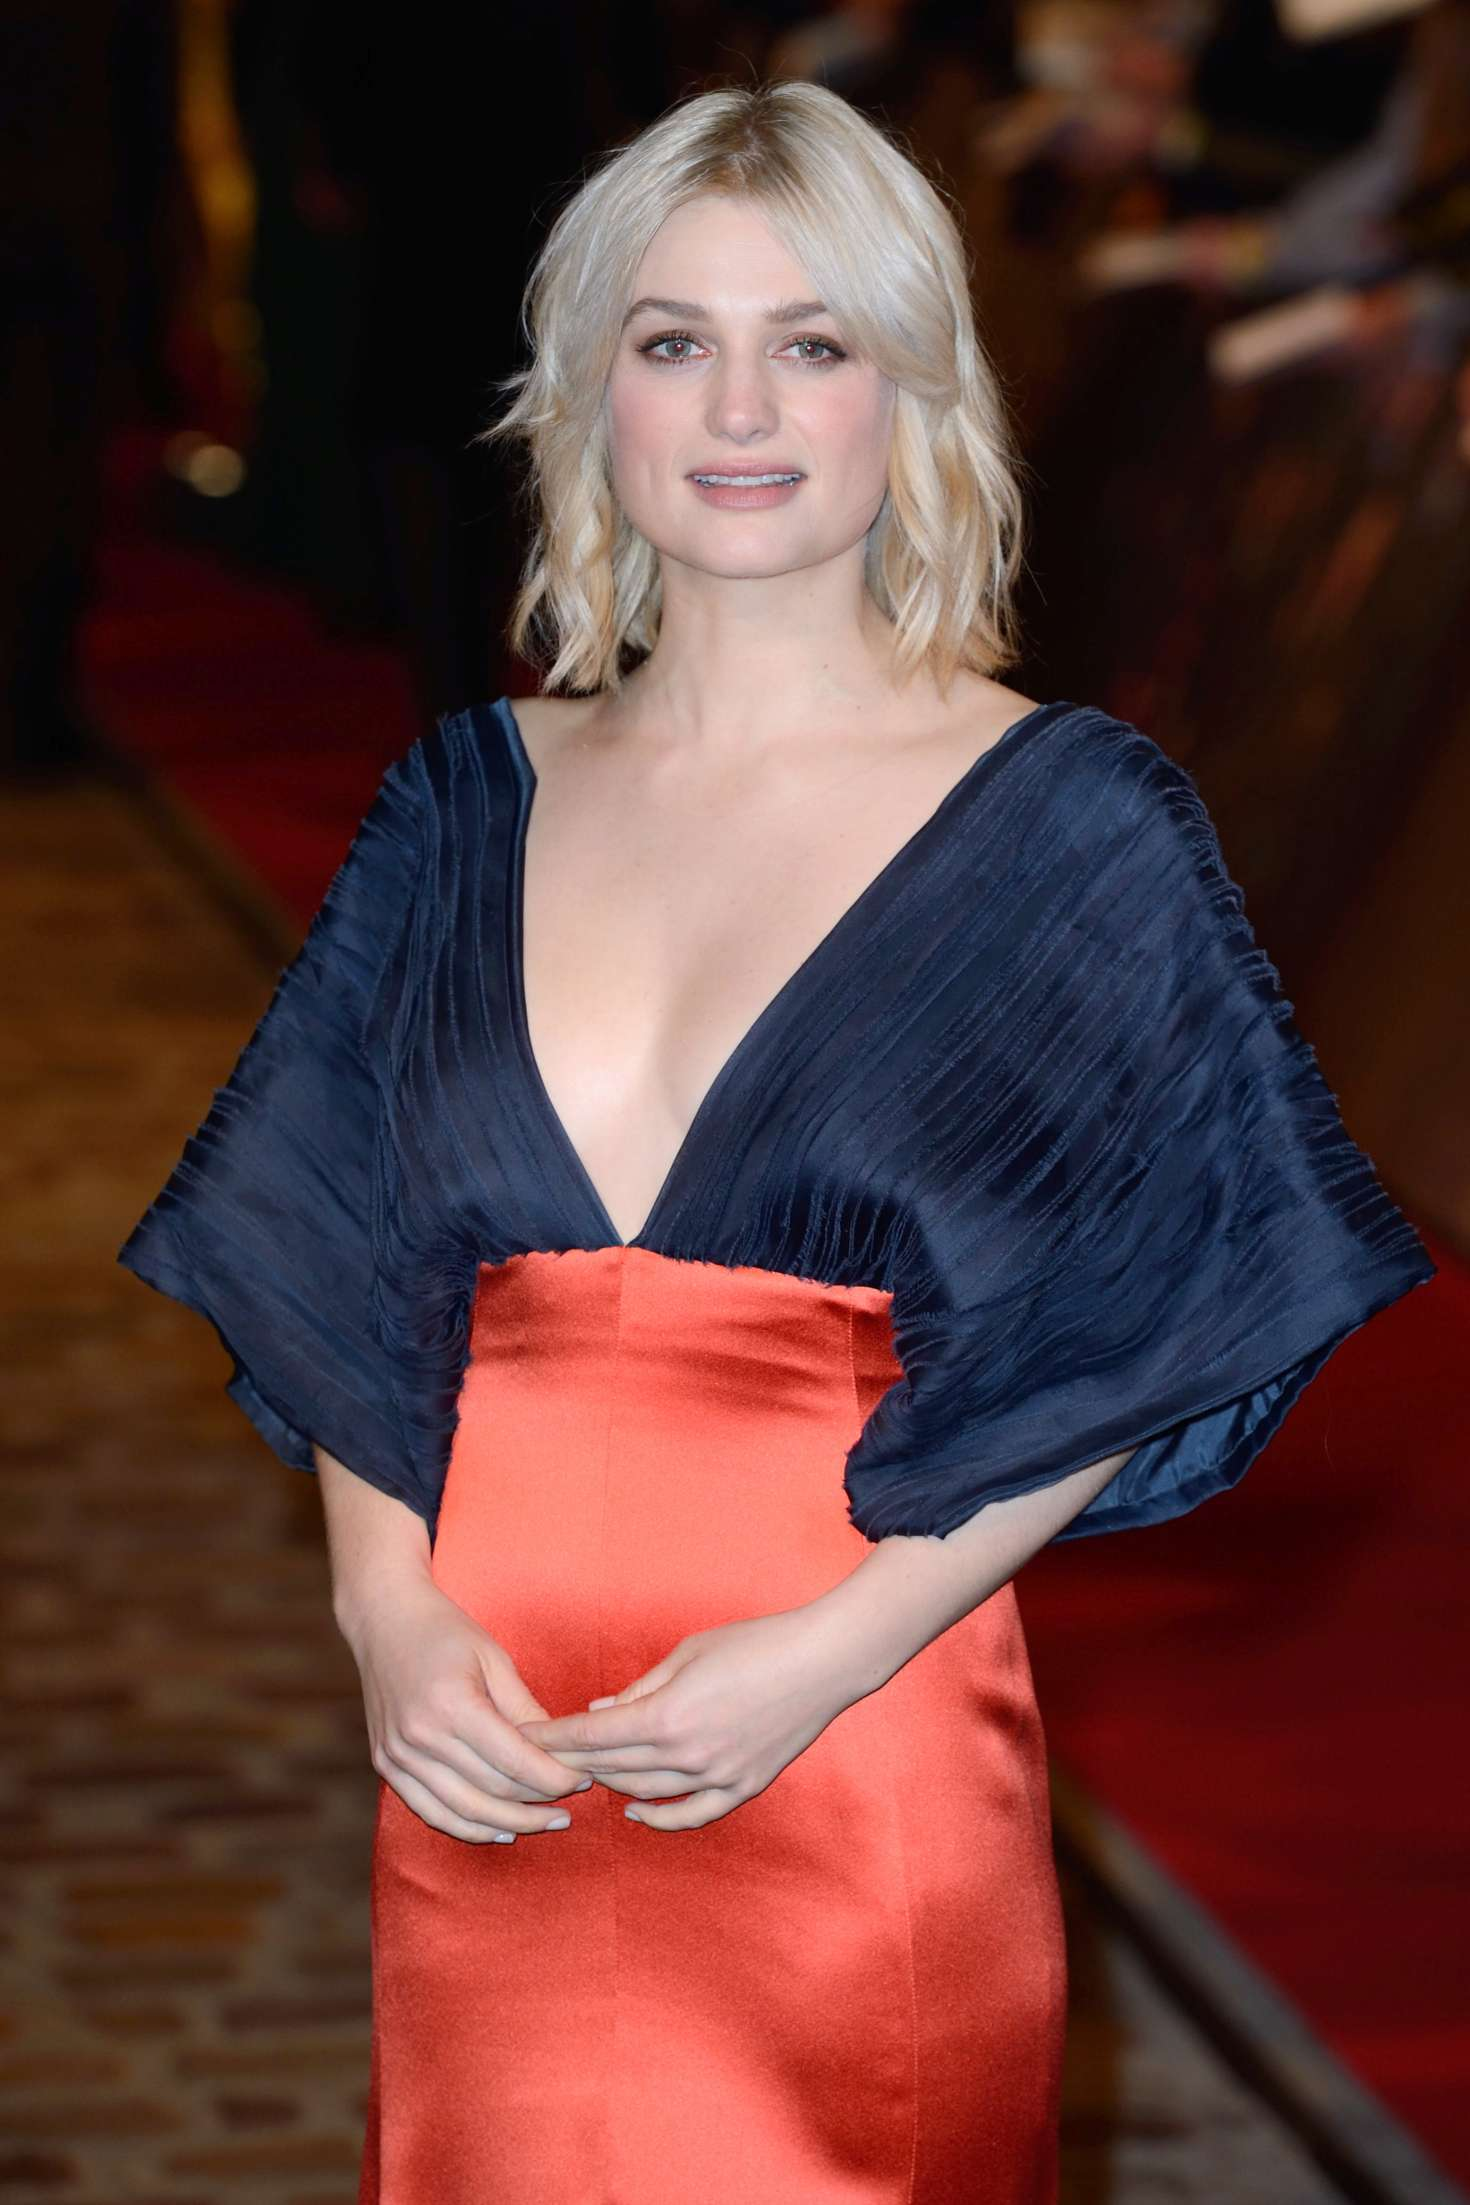 Alison Sudol - 'Fantastic Beasts The Crimes of Grindelwald' Premiere in Paris